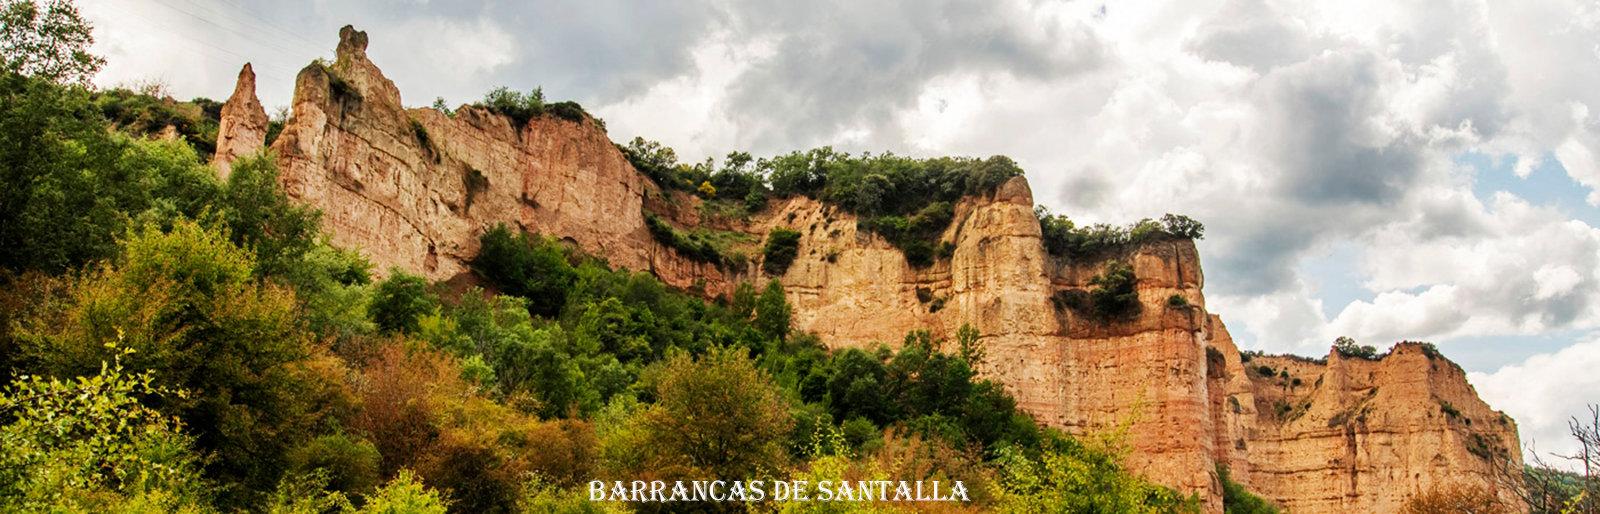 Santalla-Las Barrancas-1-web.jpg